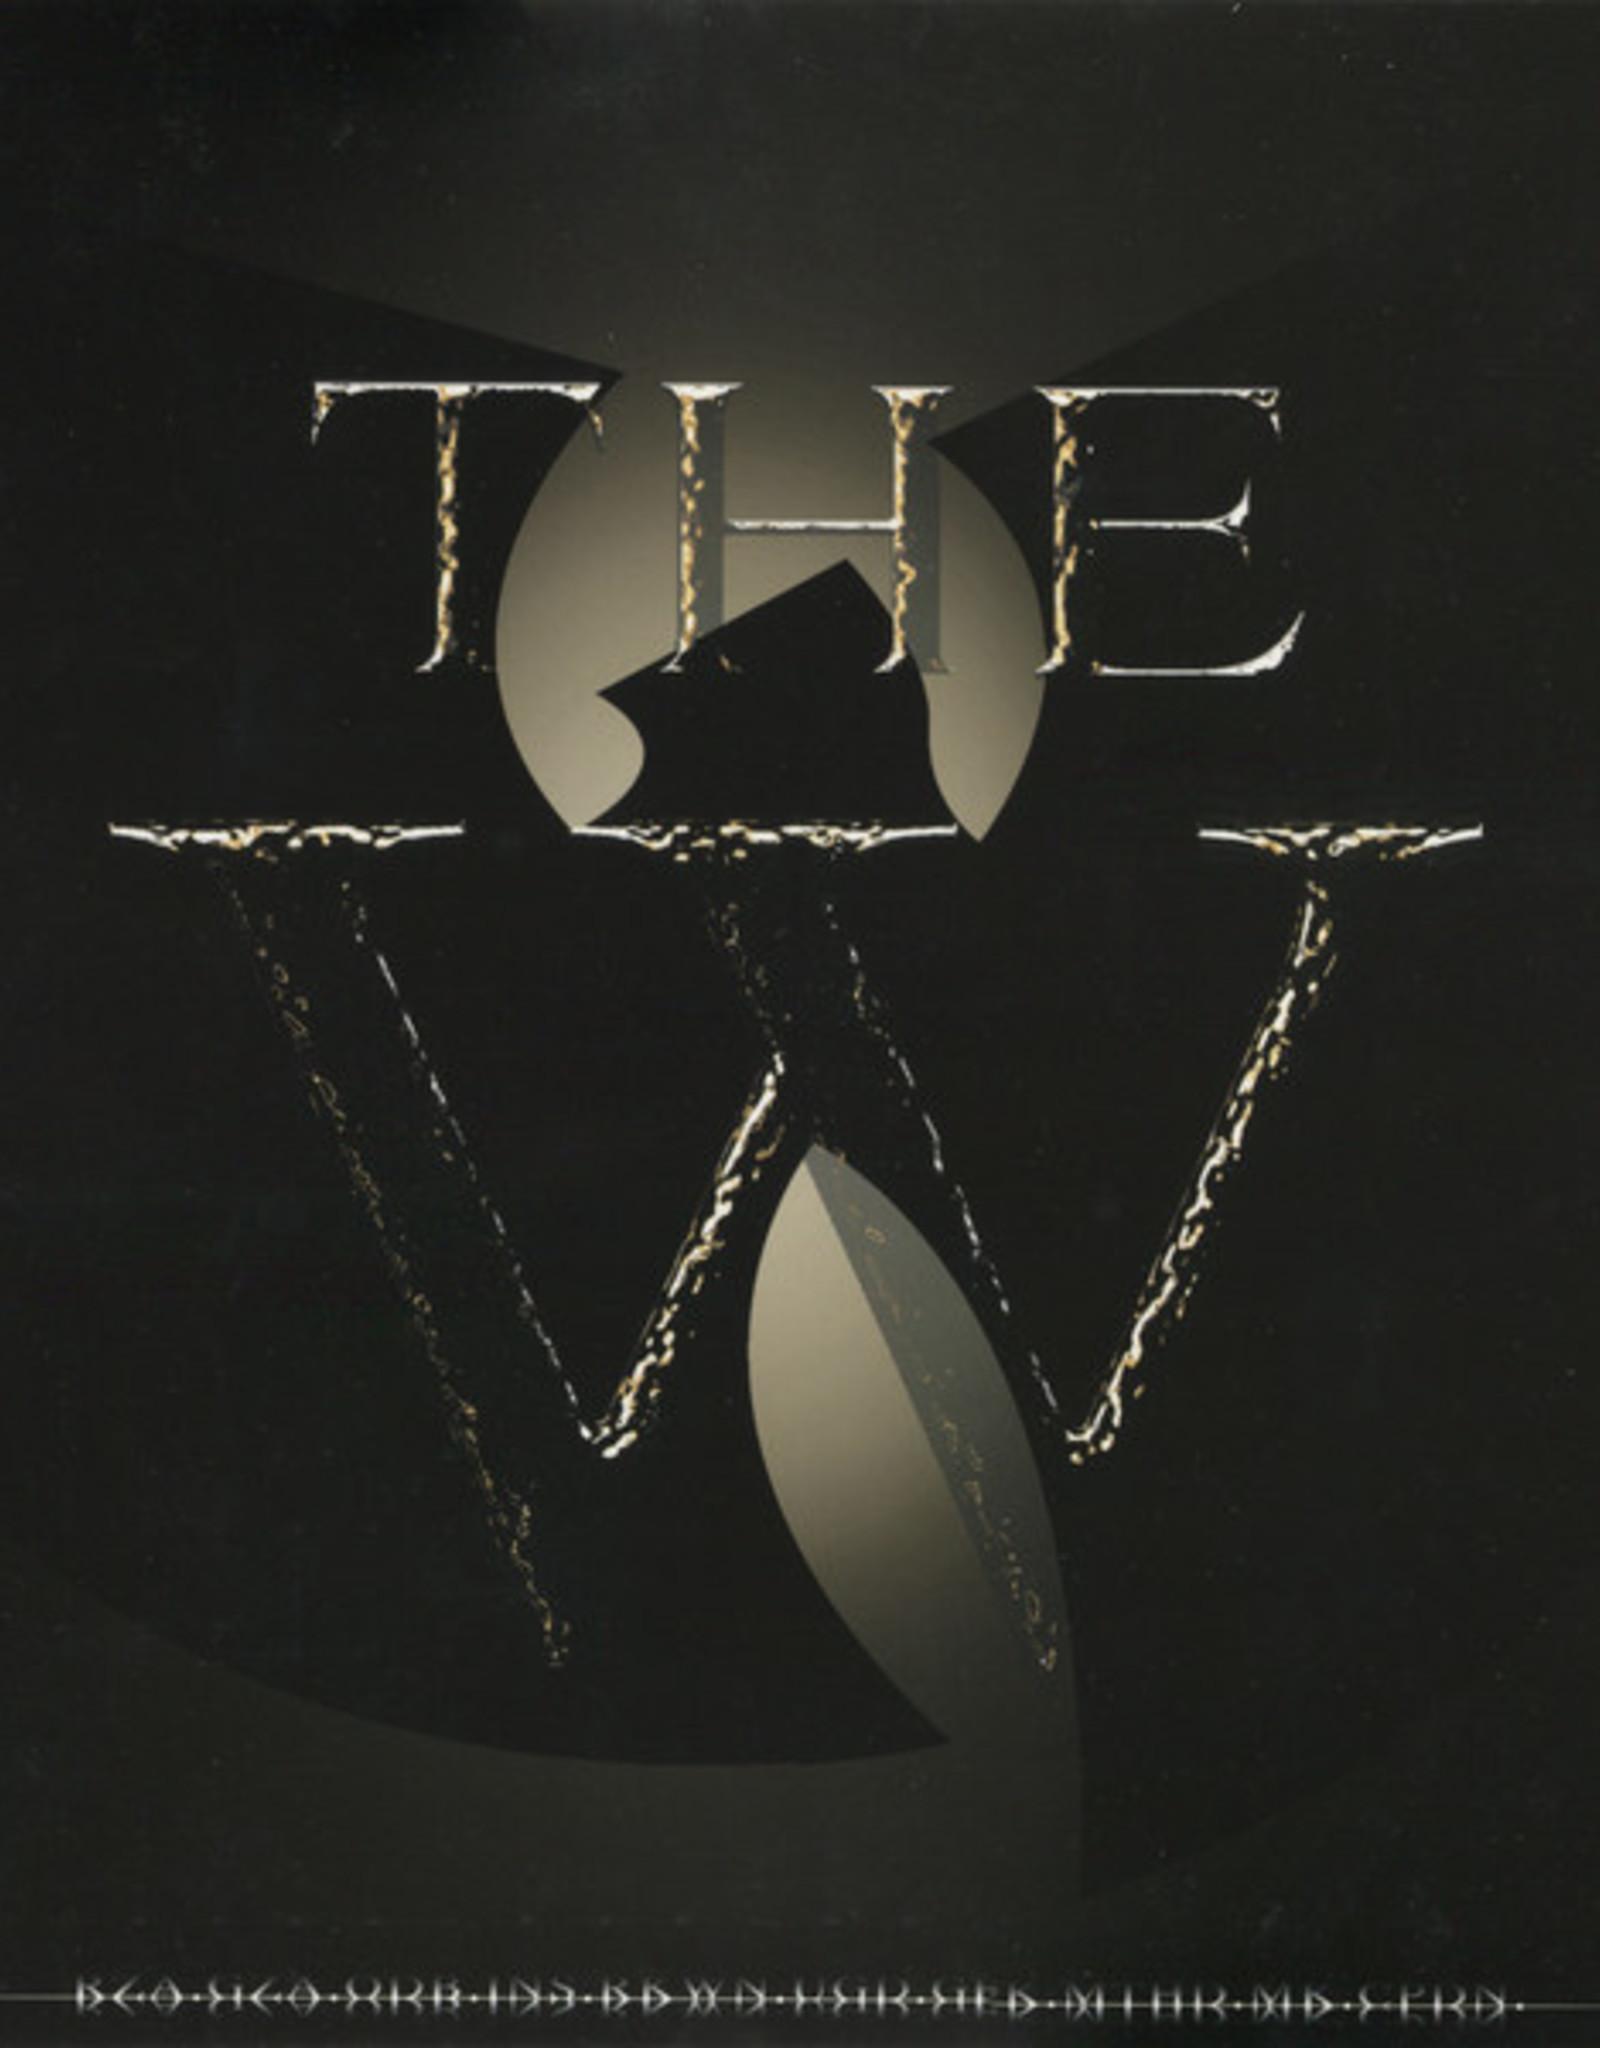 Wu-Tang Clan - W